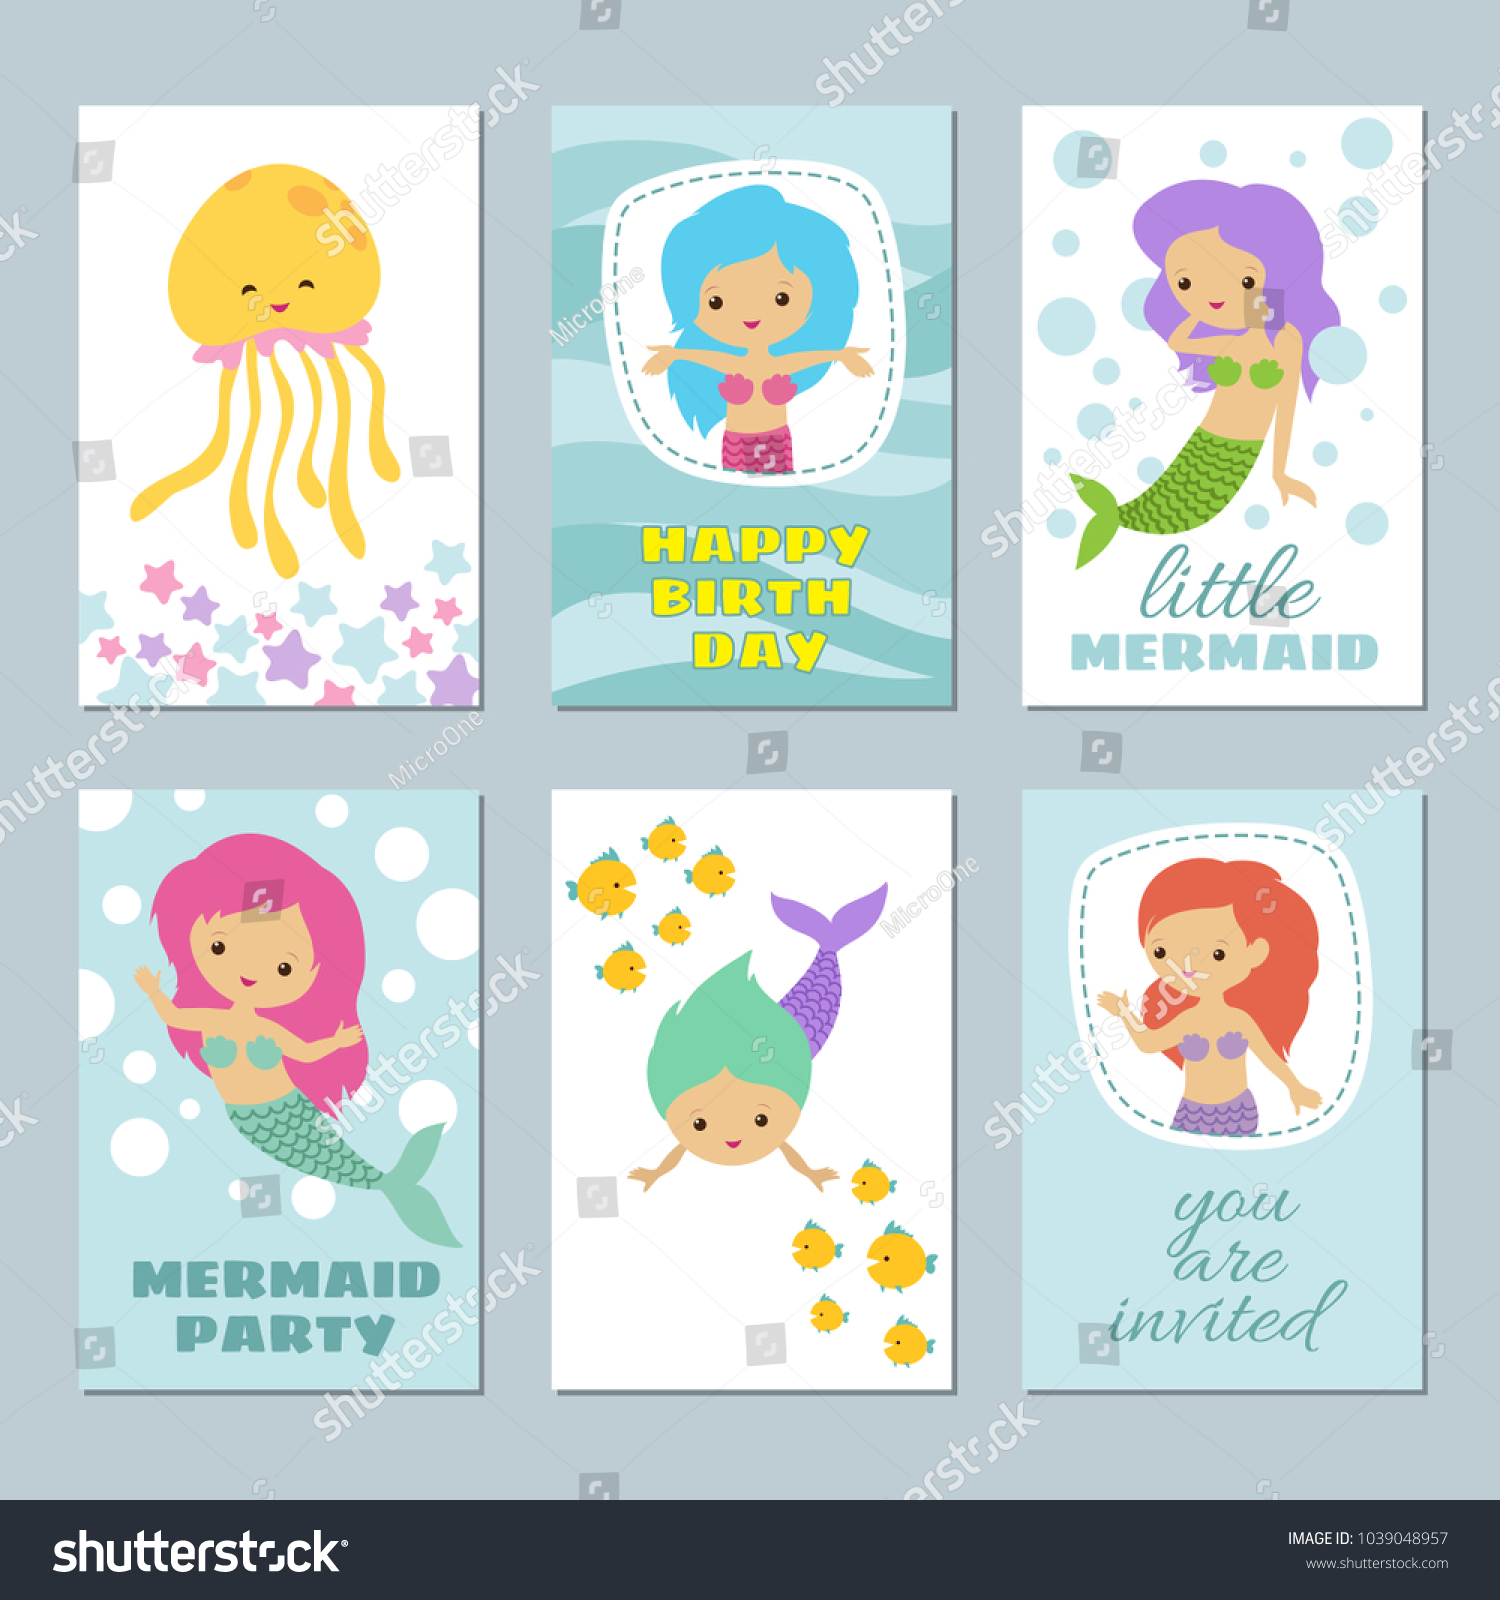 Pretty Baby Mermaids Birthday Greeting Card Stock Vector Royalty